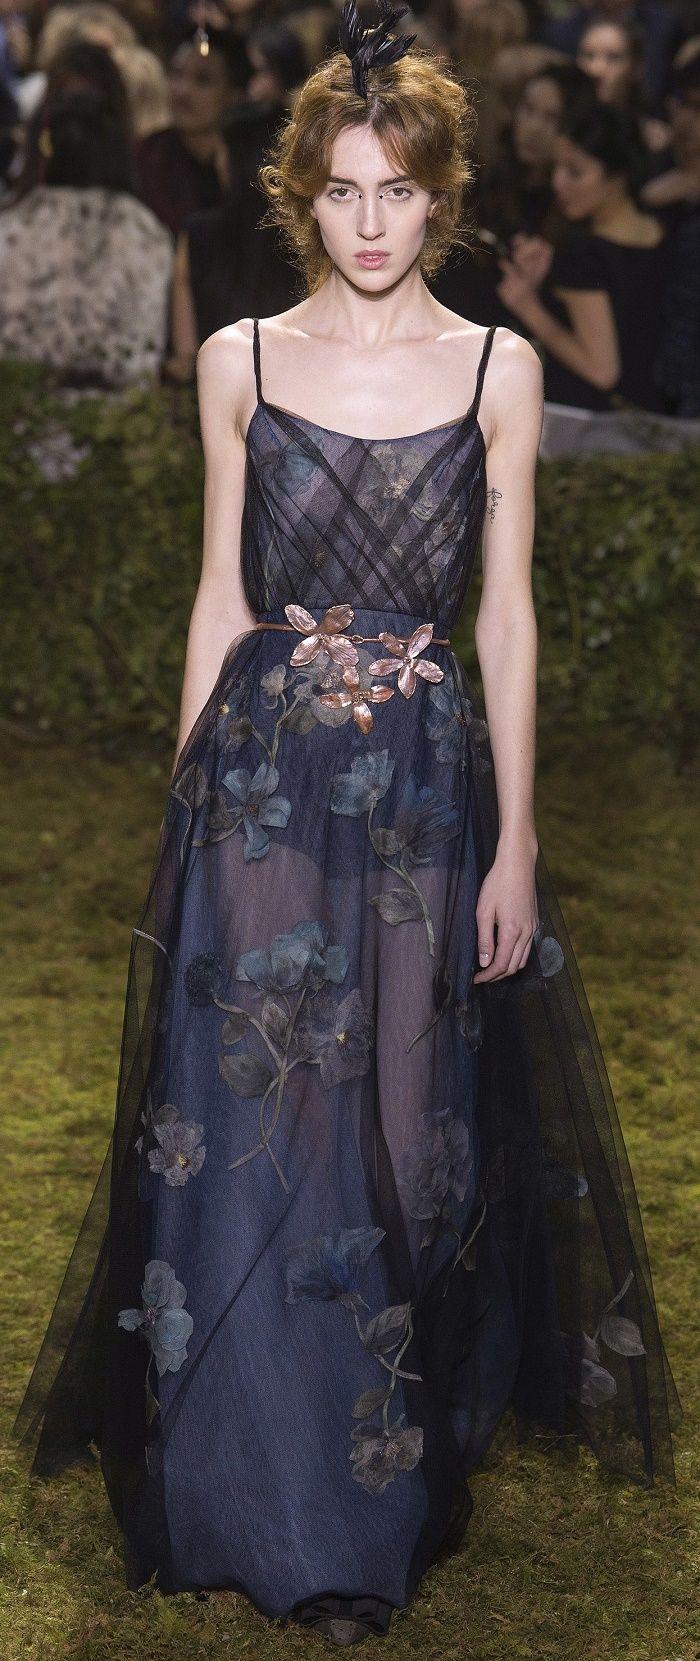 Desfile Dior AltaCostura Vero 2017 OConto de Fadas Contado porMaria Grazia Chiuri  Destaques  Fragmentos de Moda